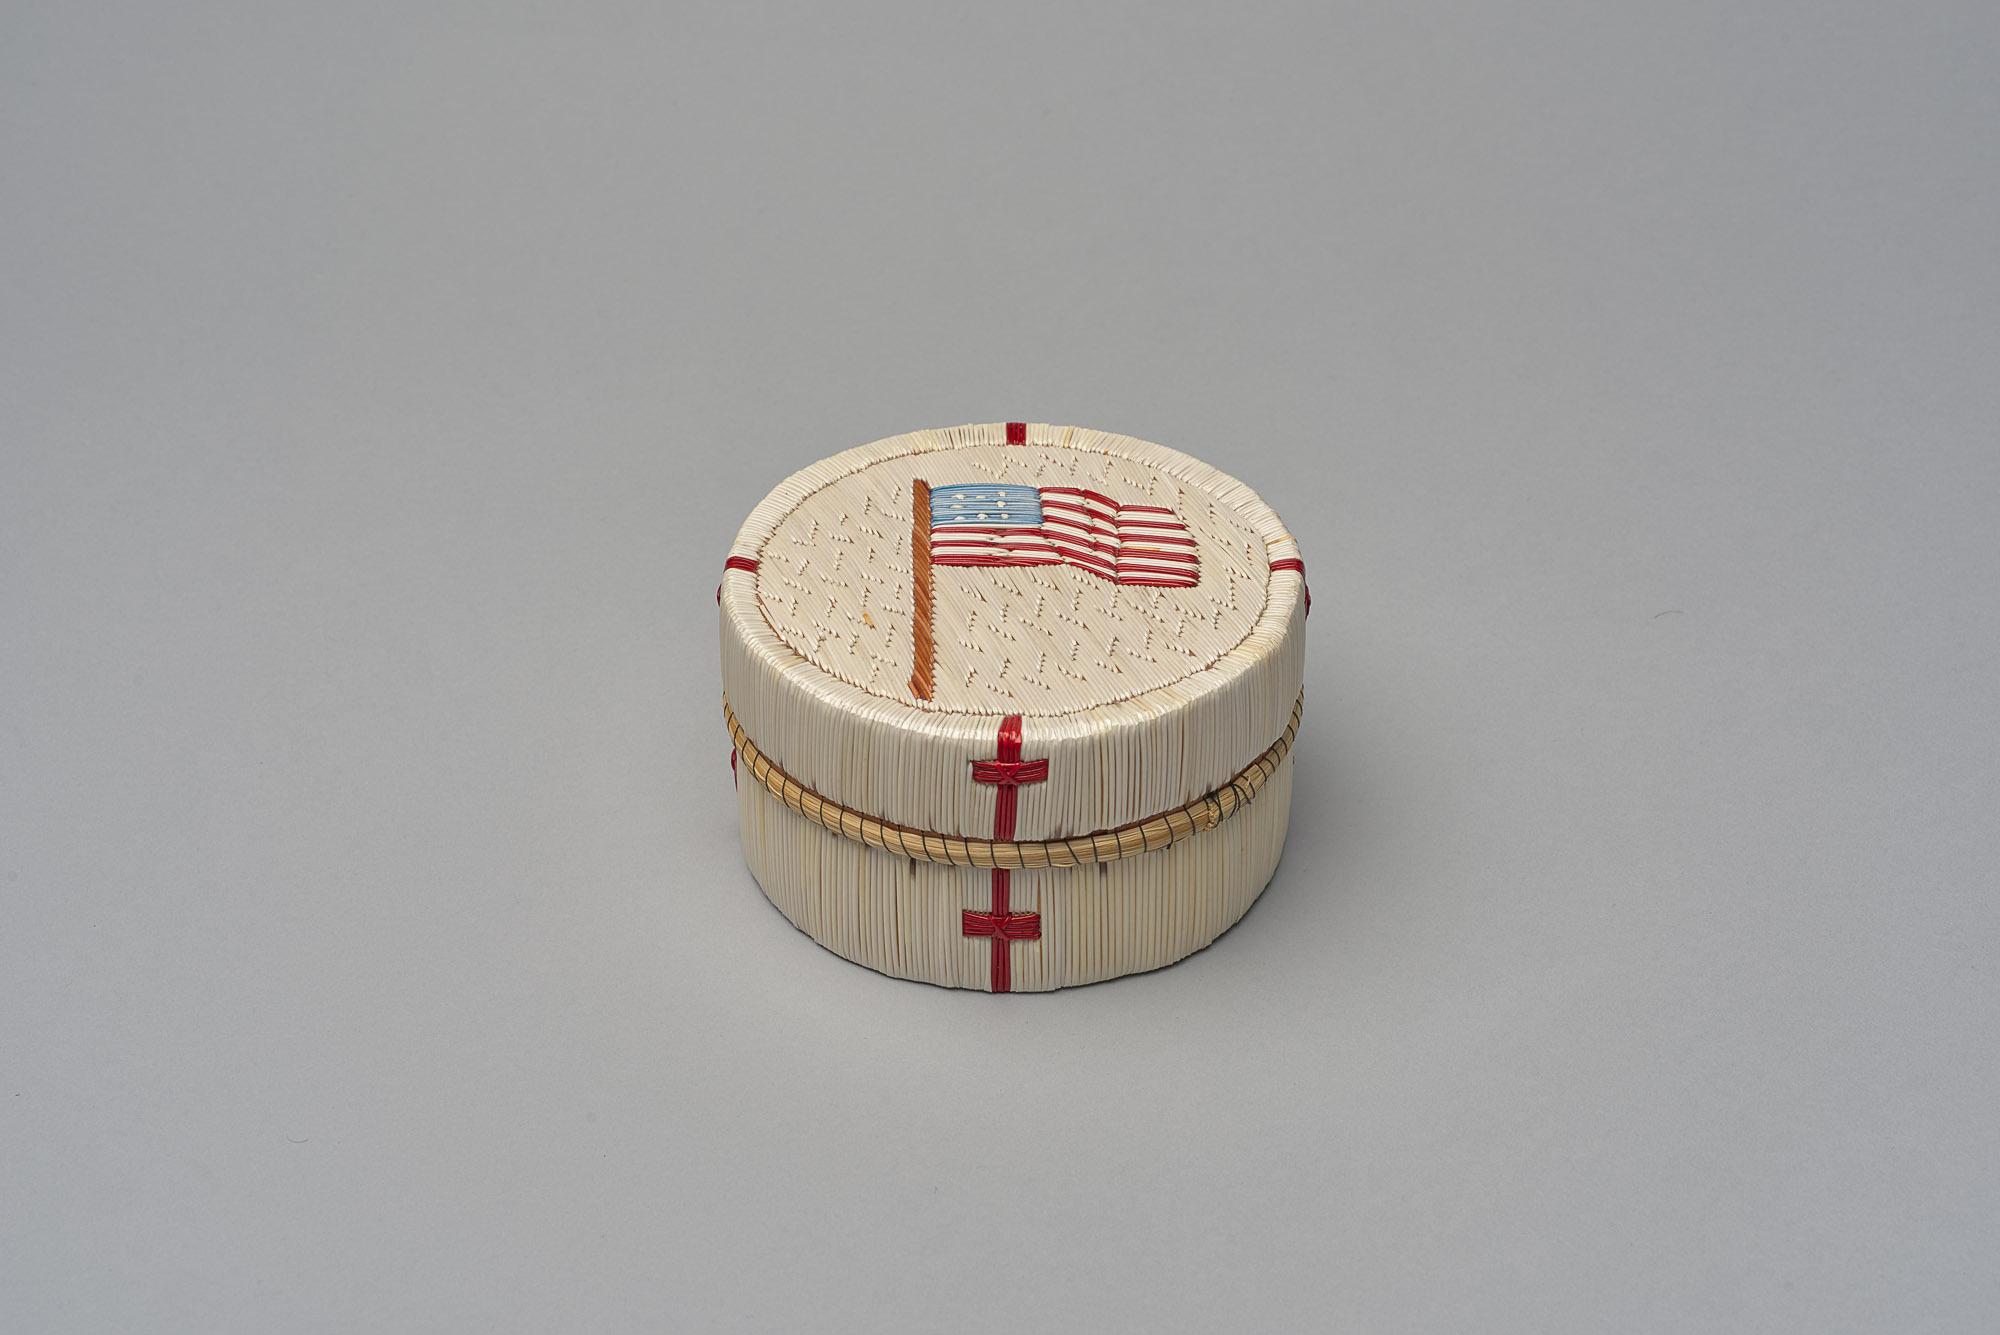 Dose mit USA-Fahne von Maime Migwans